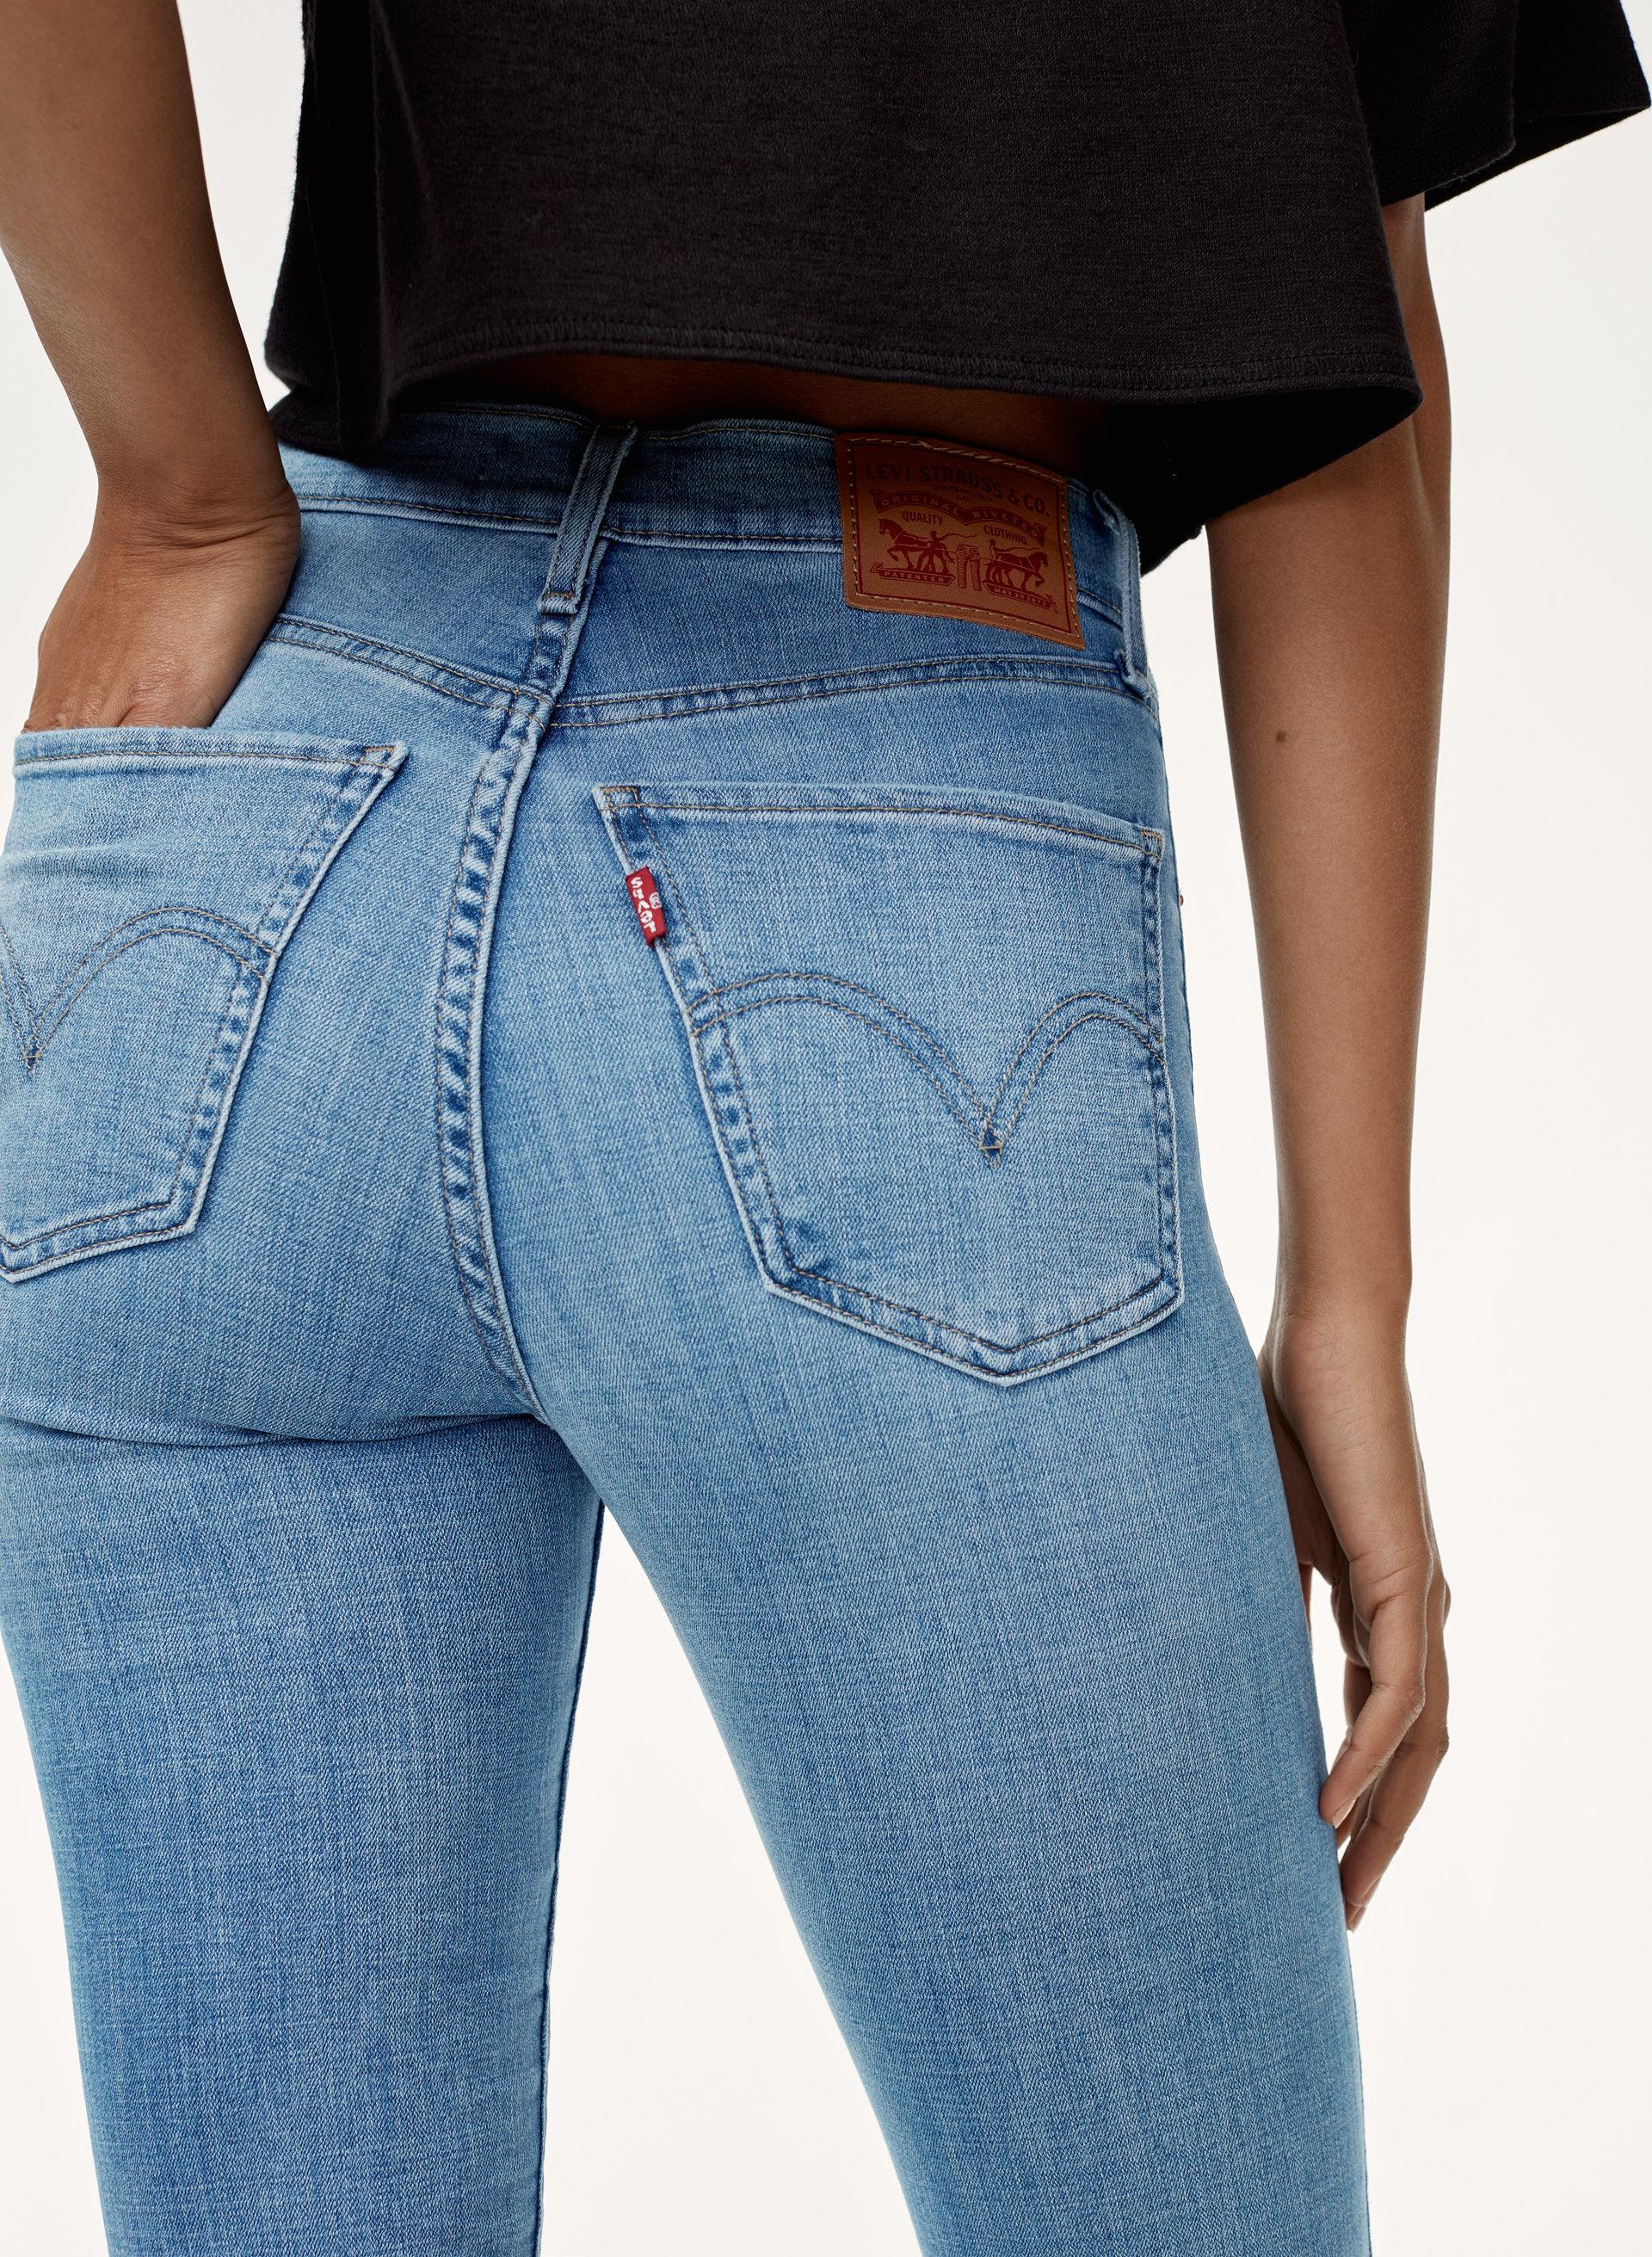 966ffdfa MILEHIGH SKINNY - High-waisted skinny jean